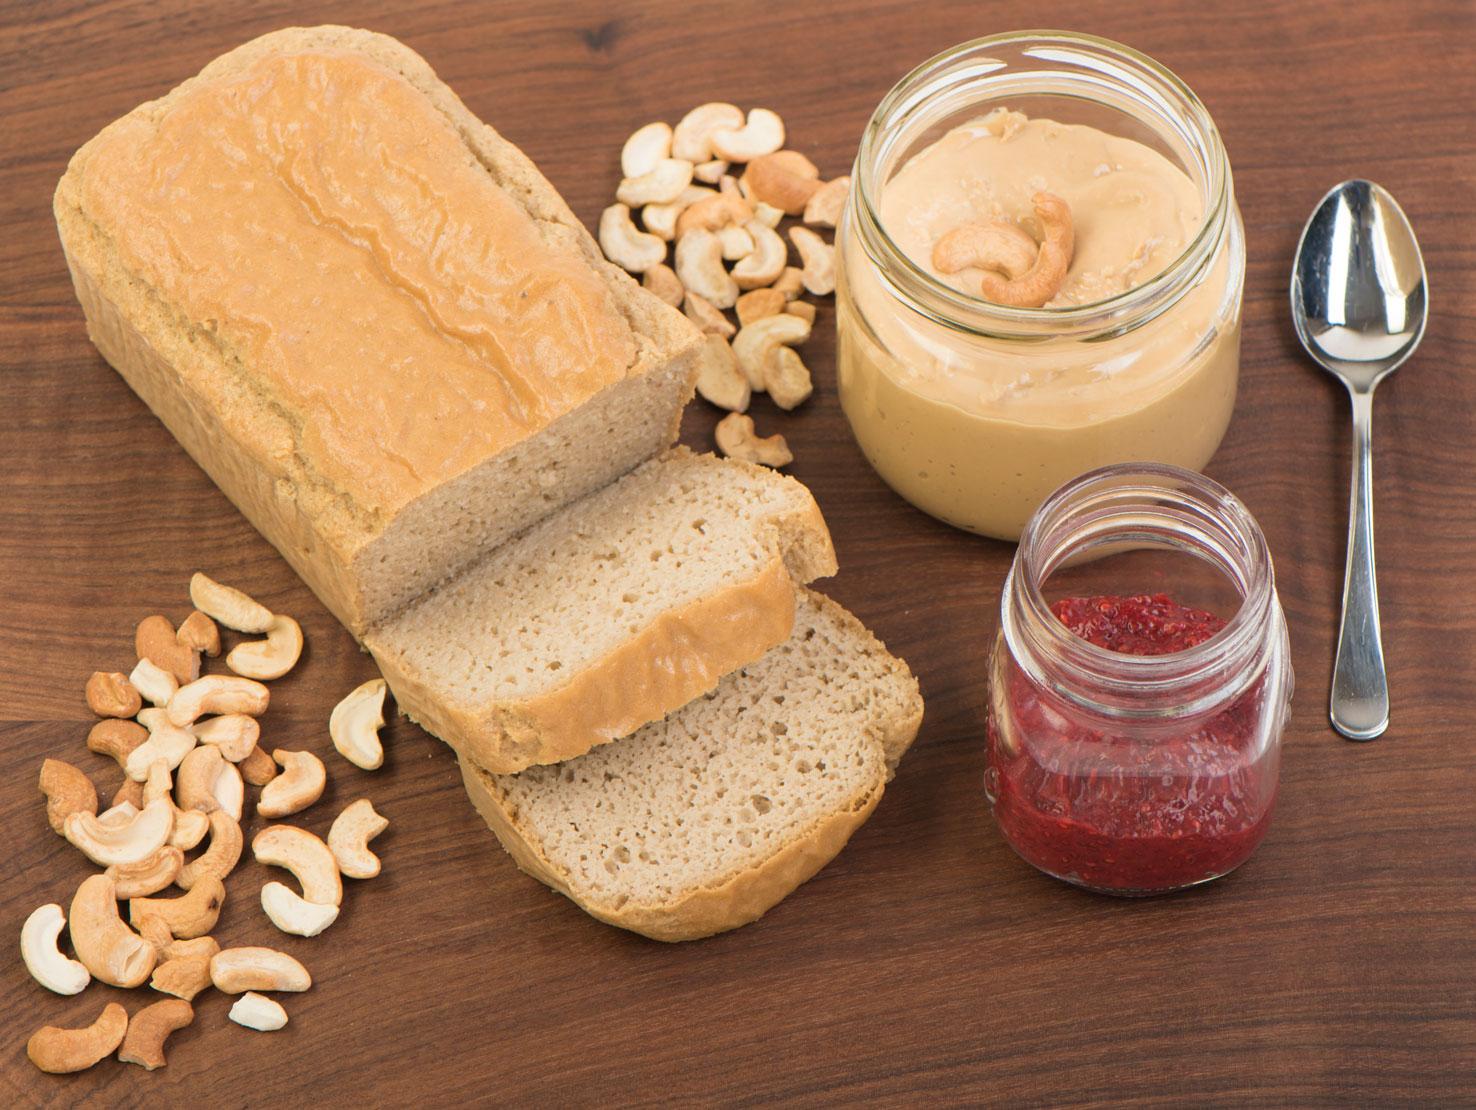 Healthy Low Carb Paleo Peanut Butter Sandwich